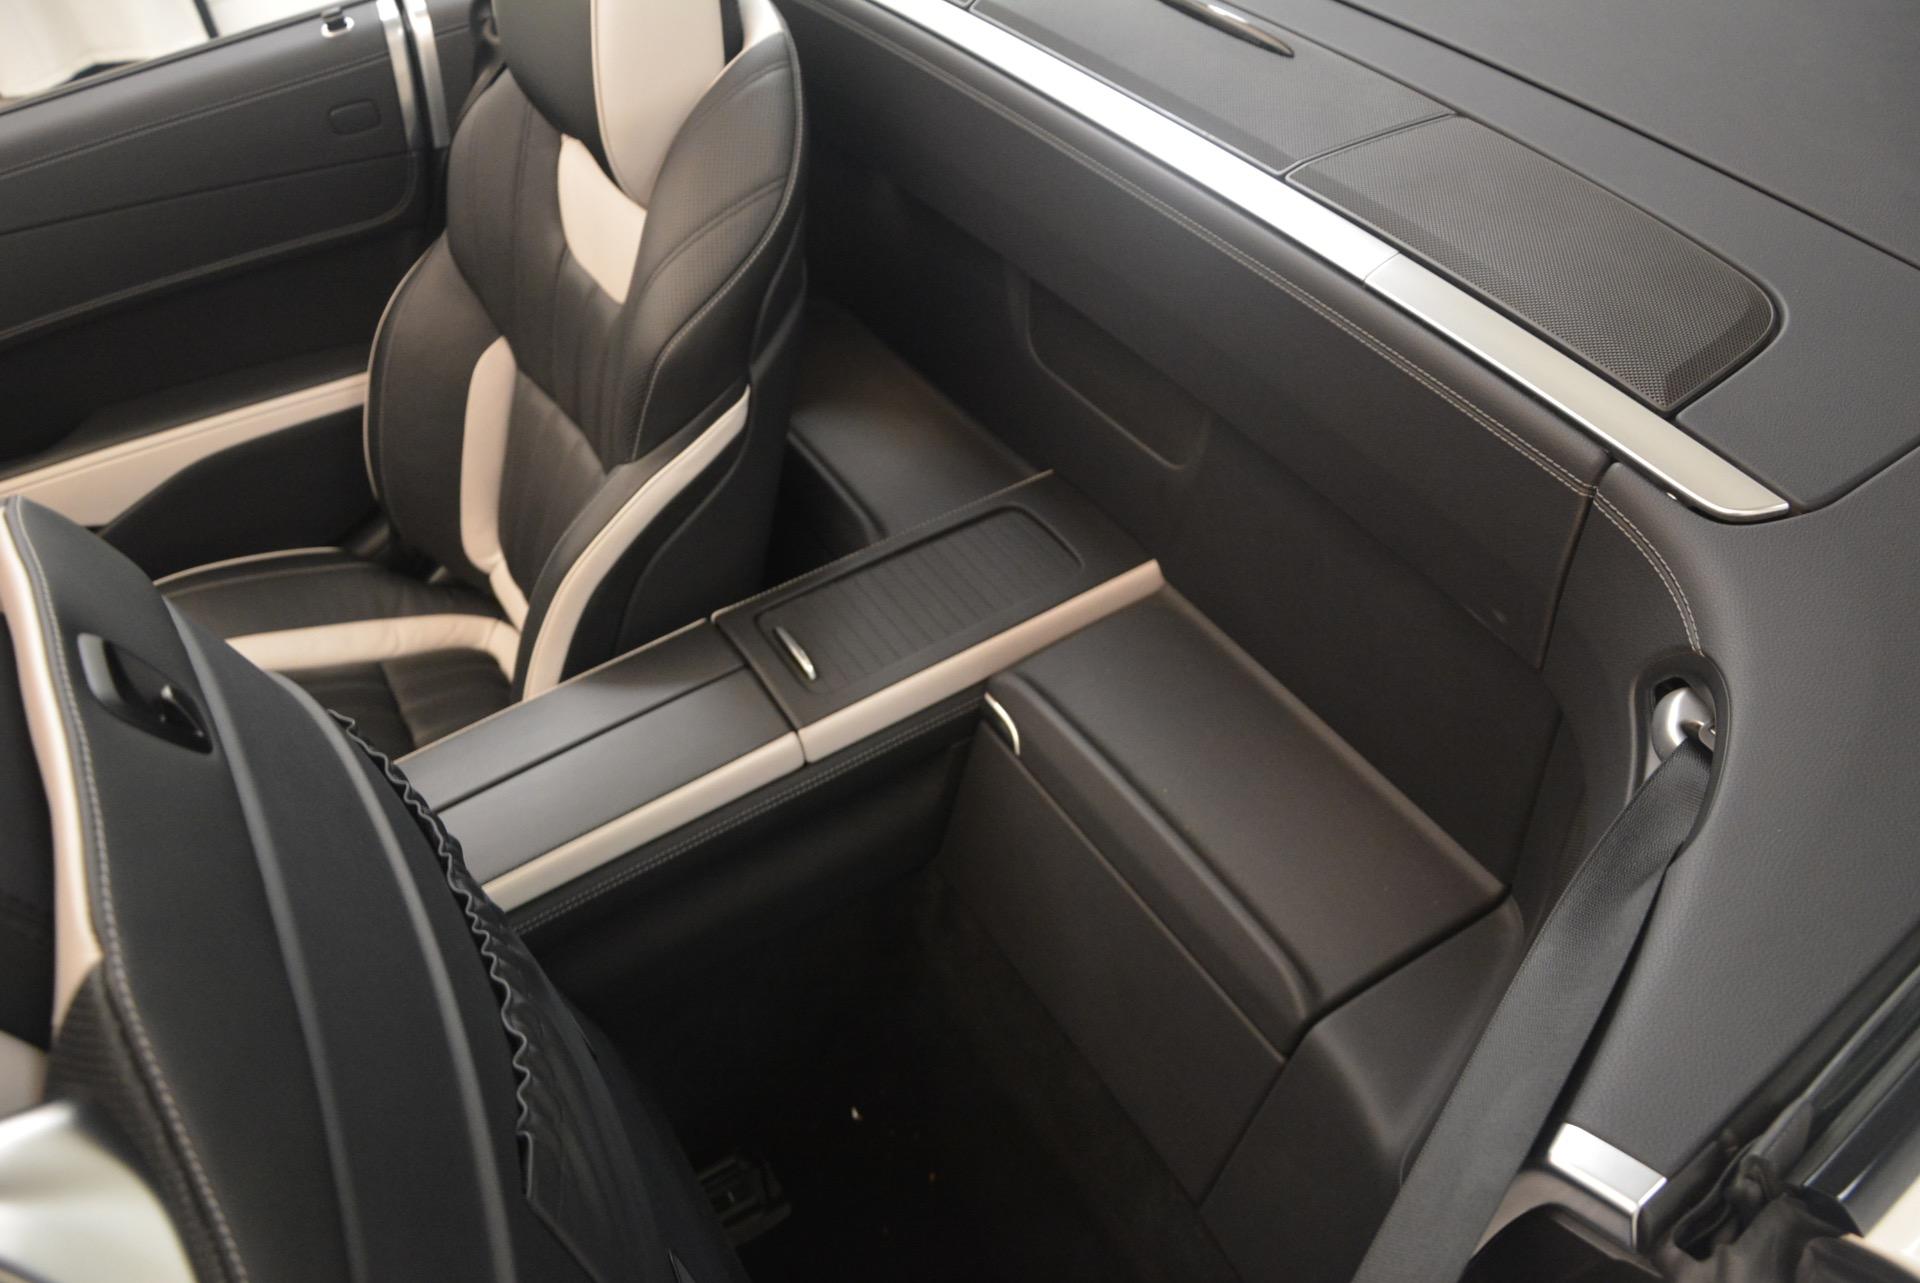 Used 2015 Mercedes Benz SL-Class SL 550 For Sale In Greenwich, CT. Alfa Romeo of Greenwich, M1874A 1261_p48